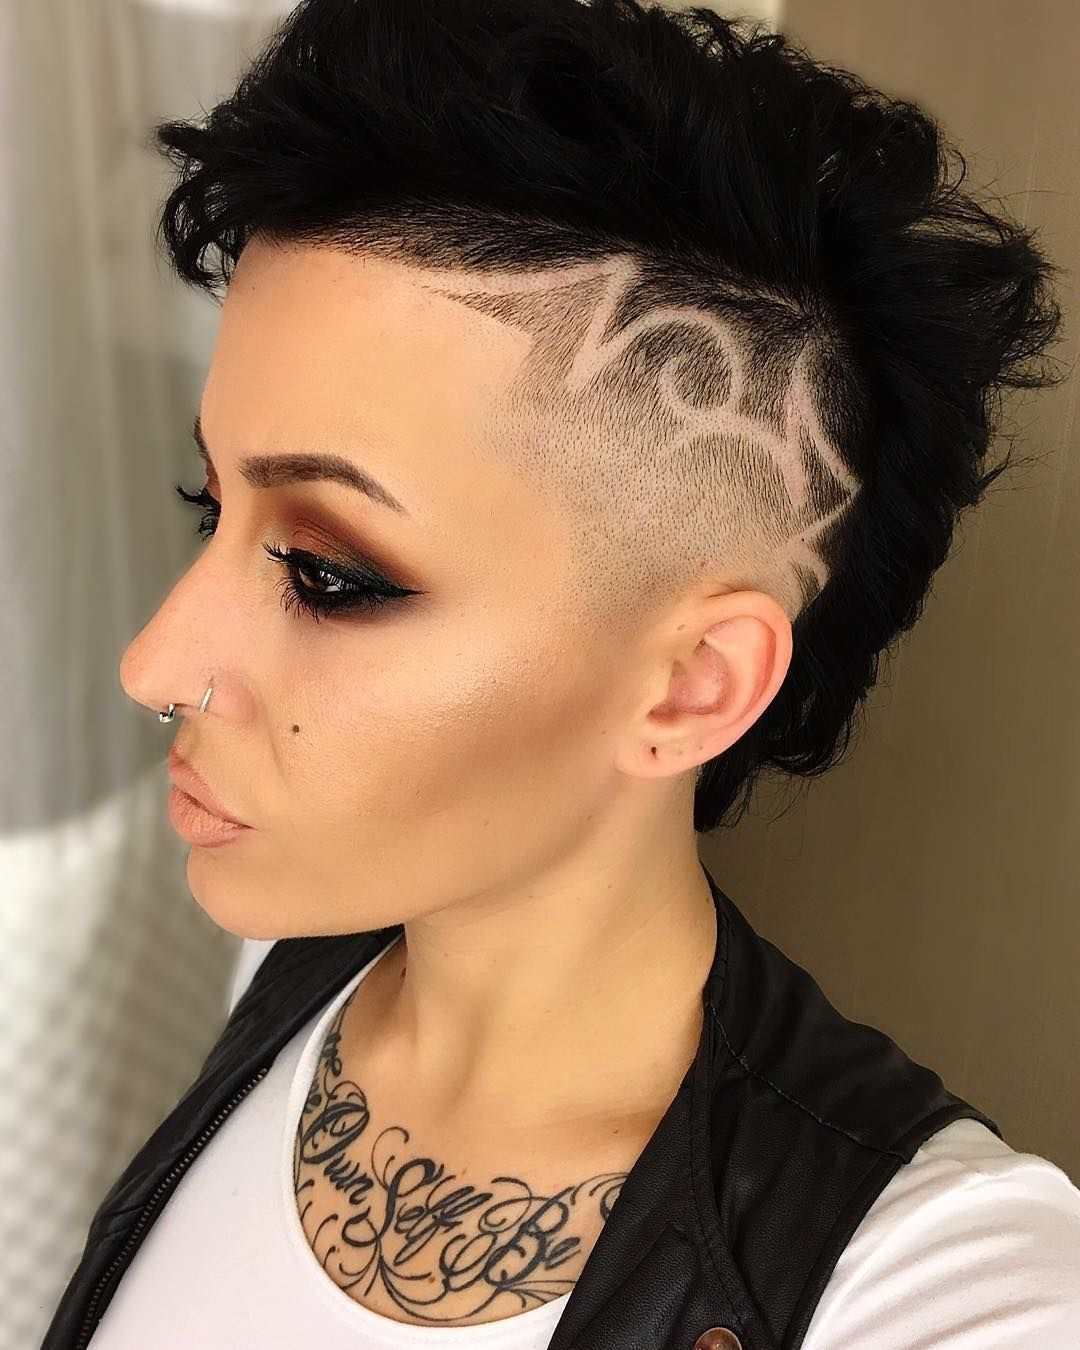 Super Kurze Frisuren Halb Rasiert Neue Haare Modelle Frisuren Kurz Frisur Eine Seite Kurz Frisur Langes Gesicht